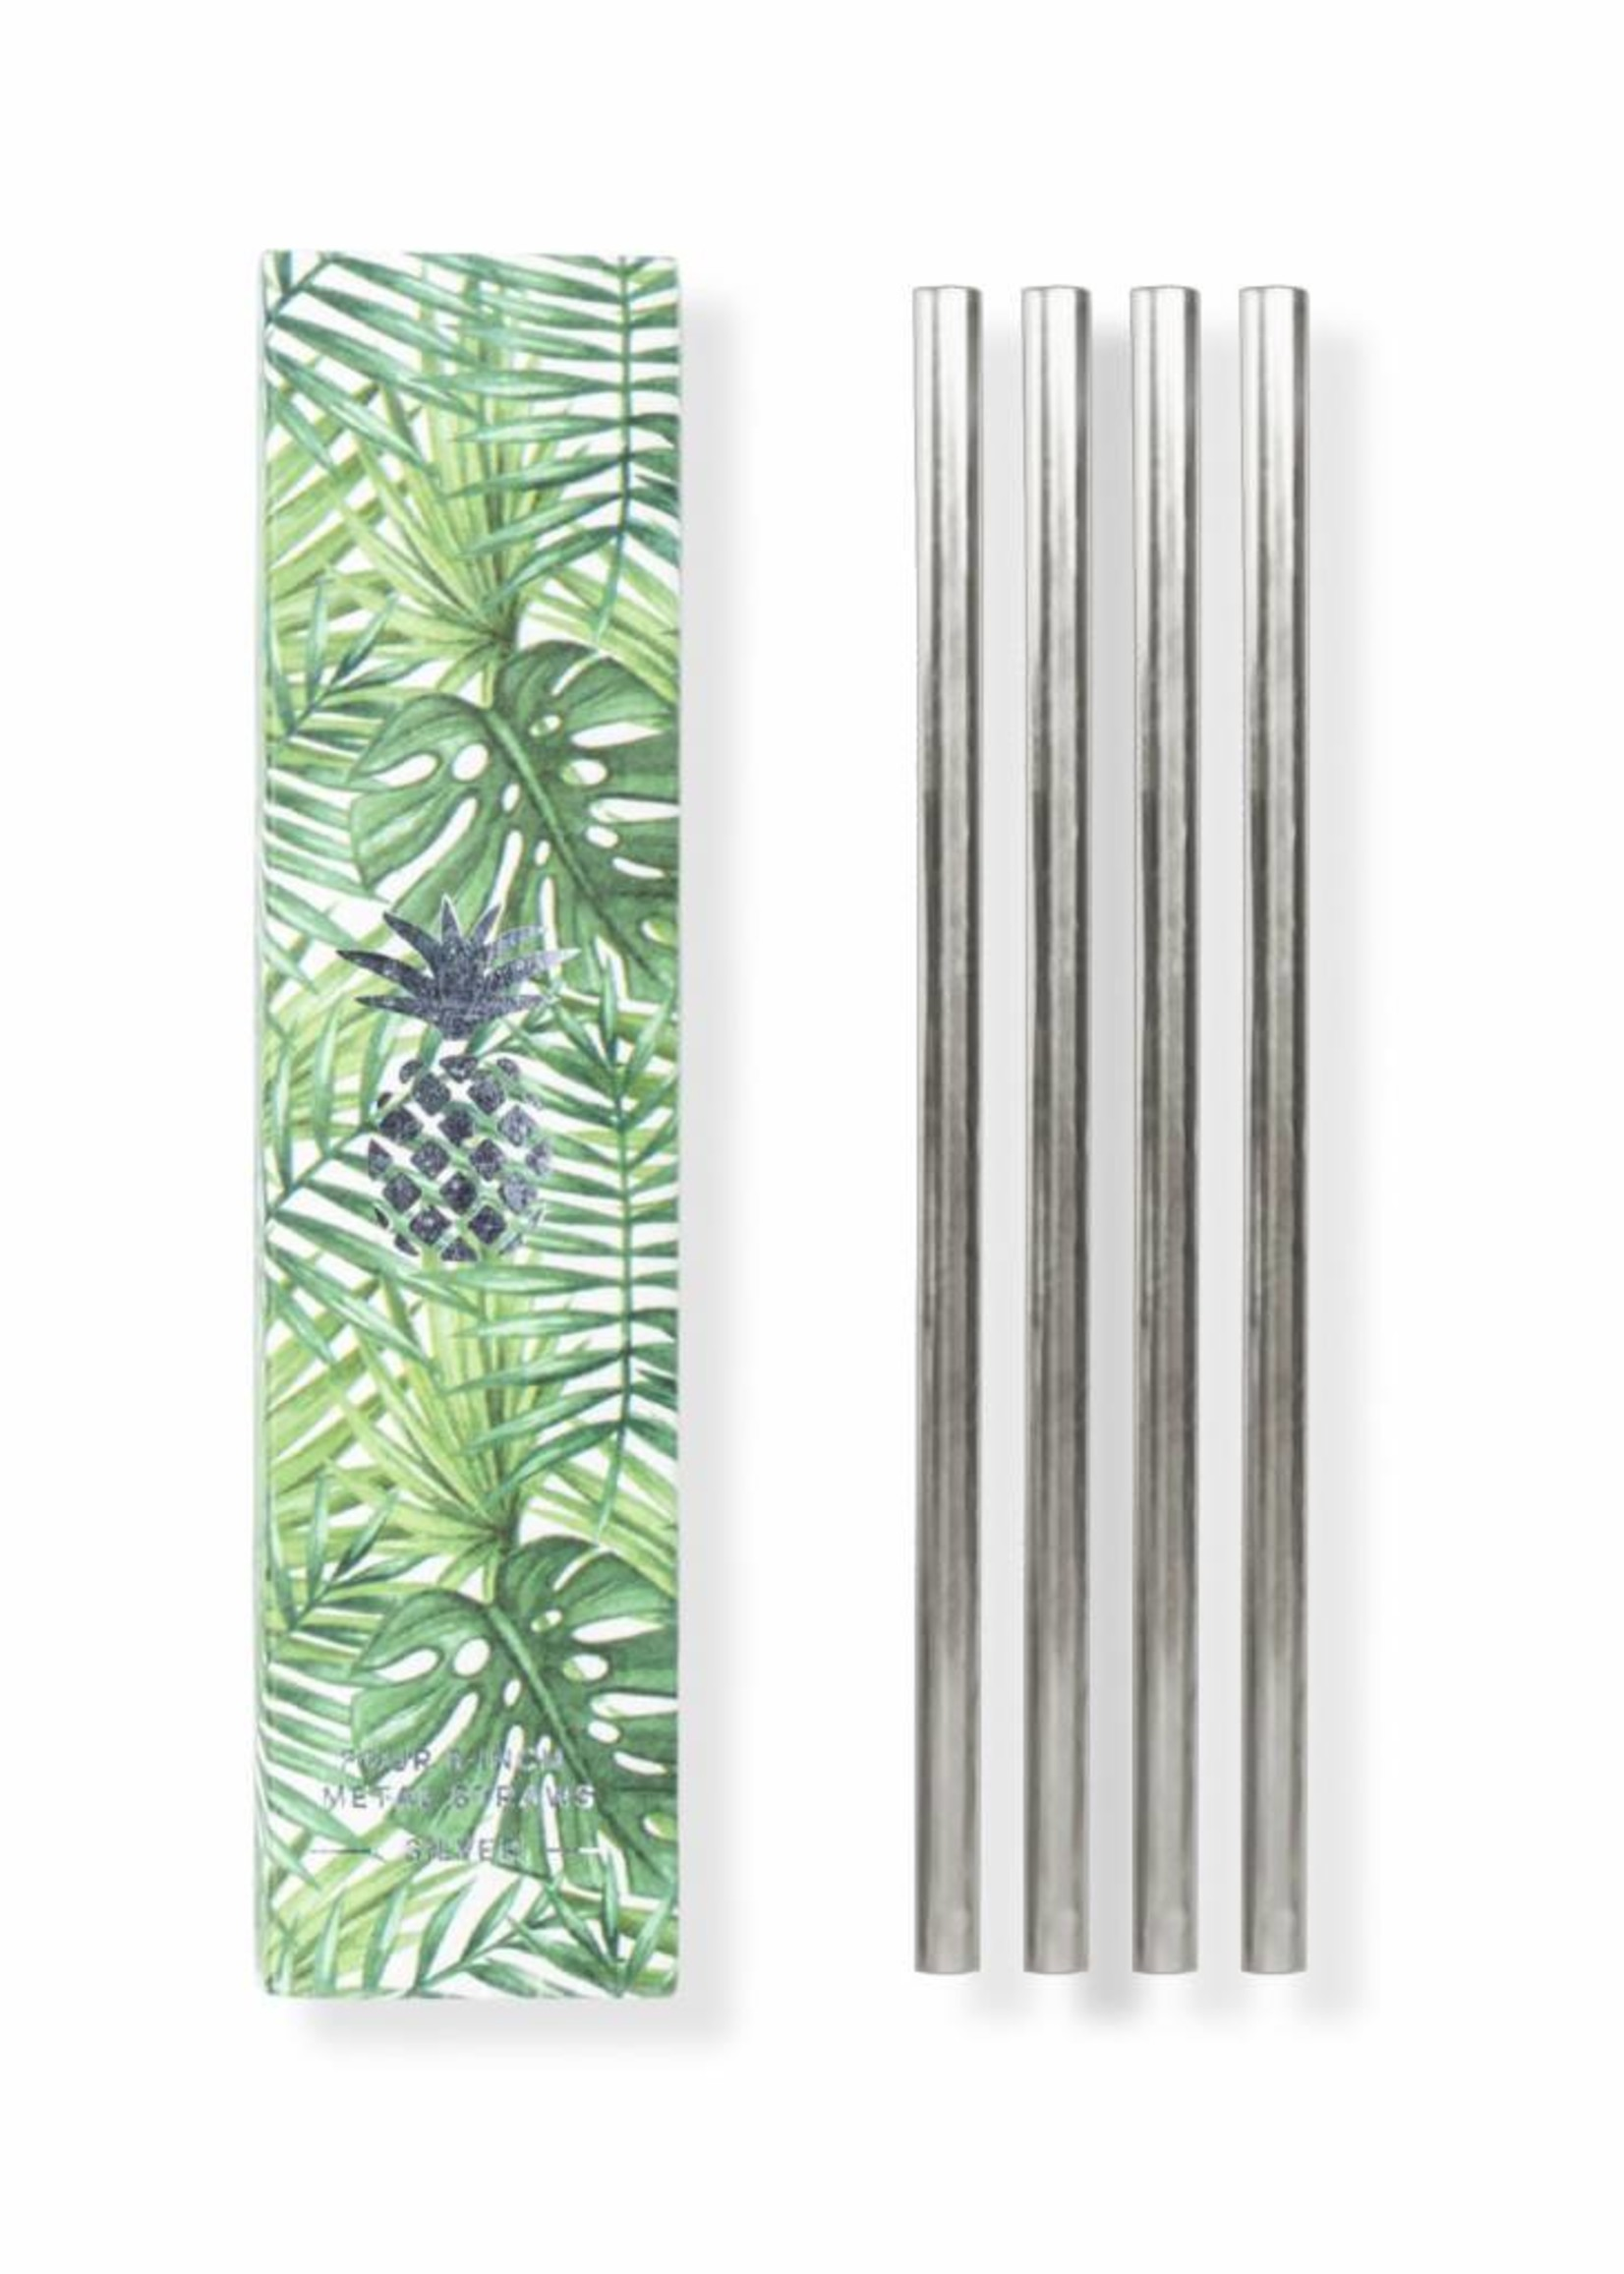 W&P Set of 4 Metal Straws